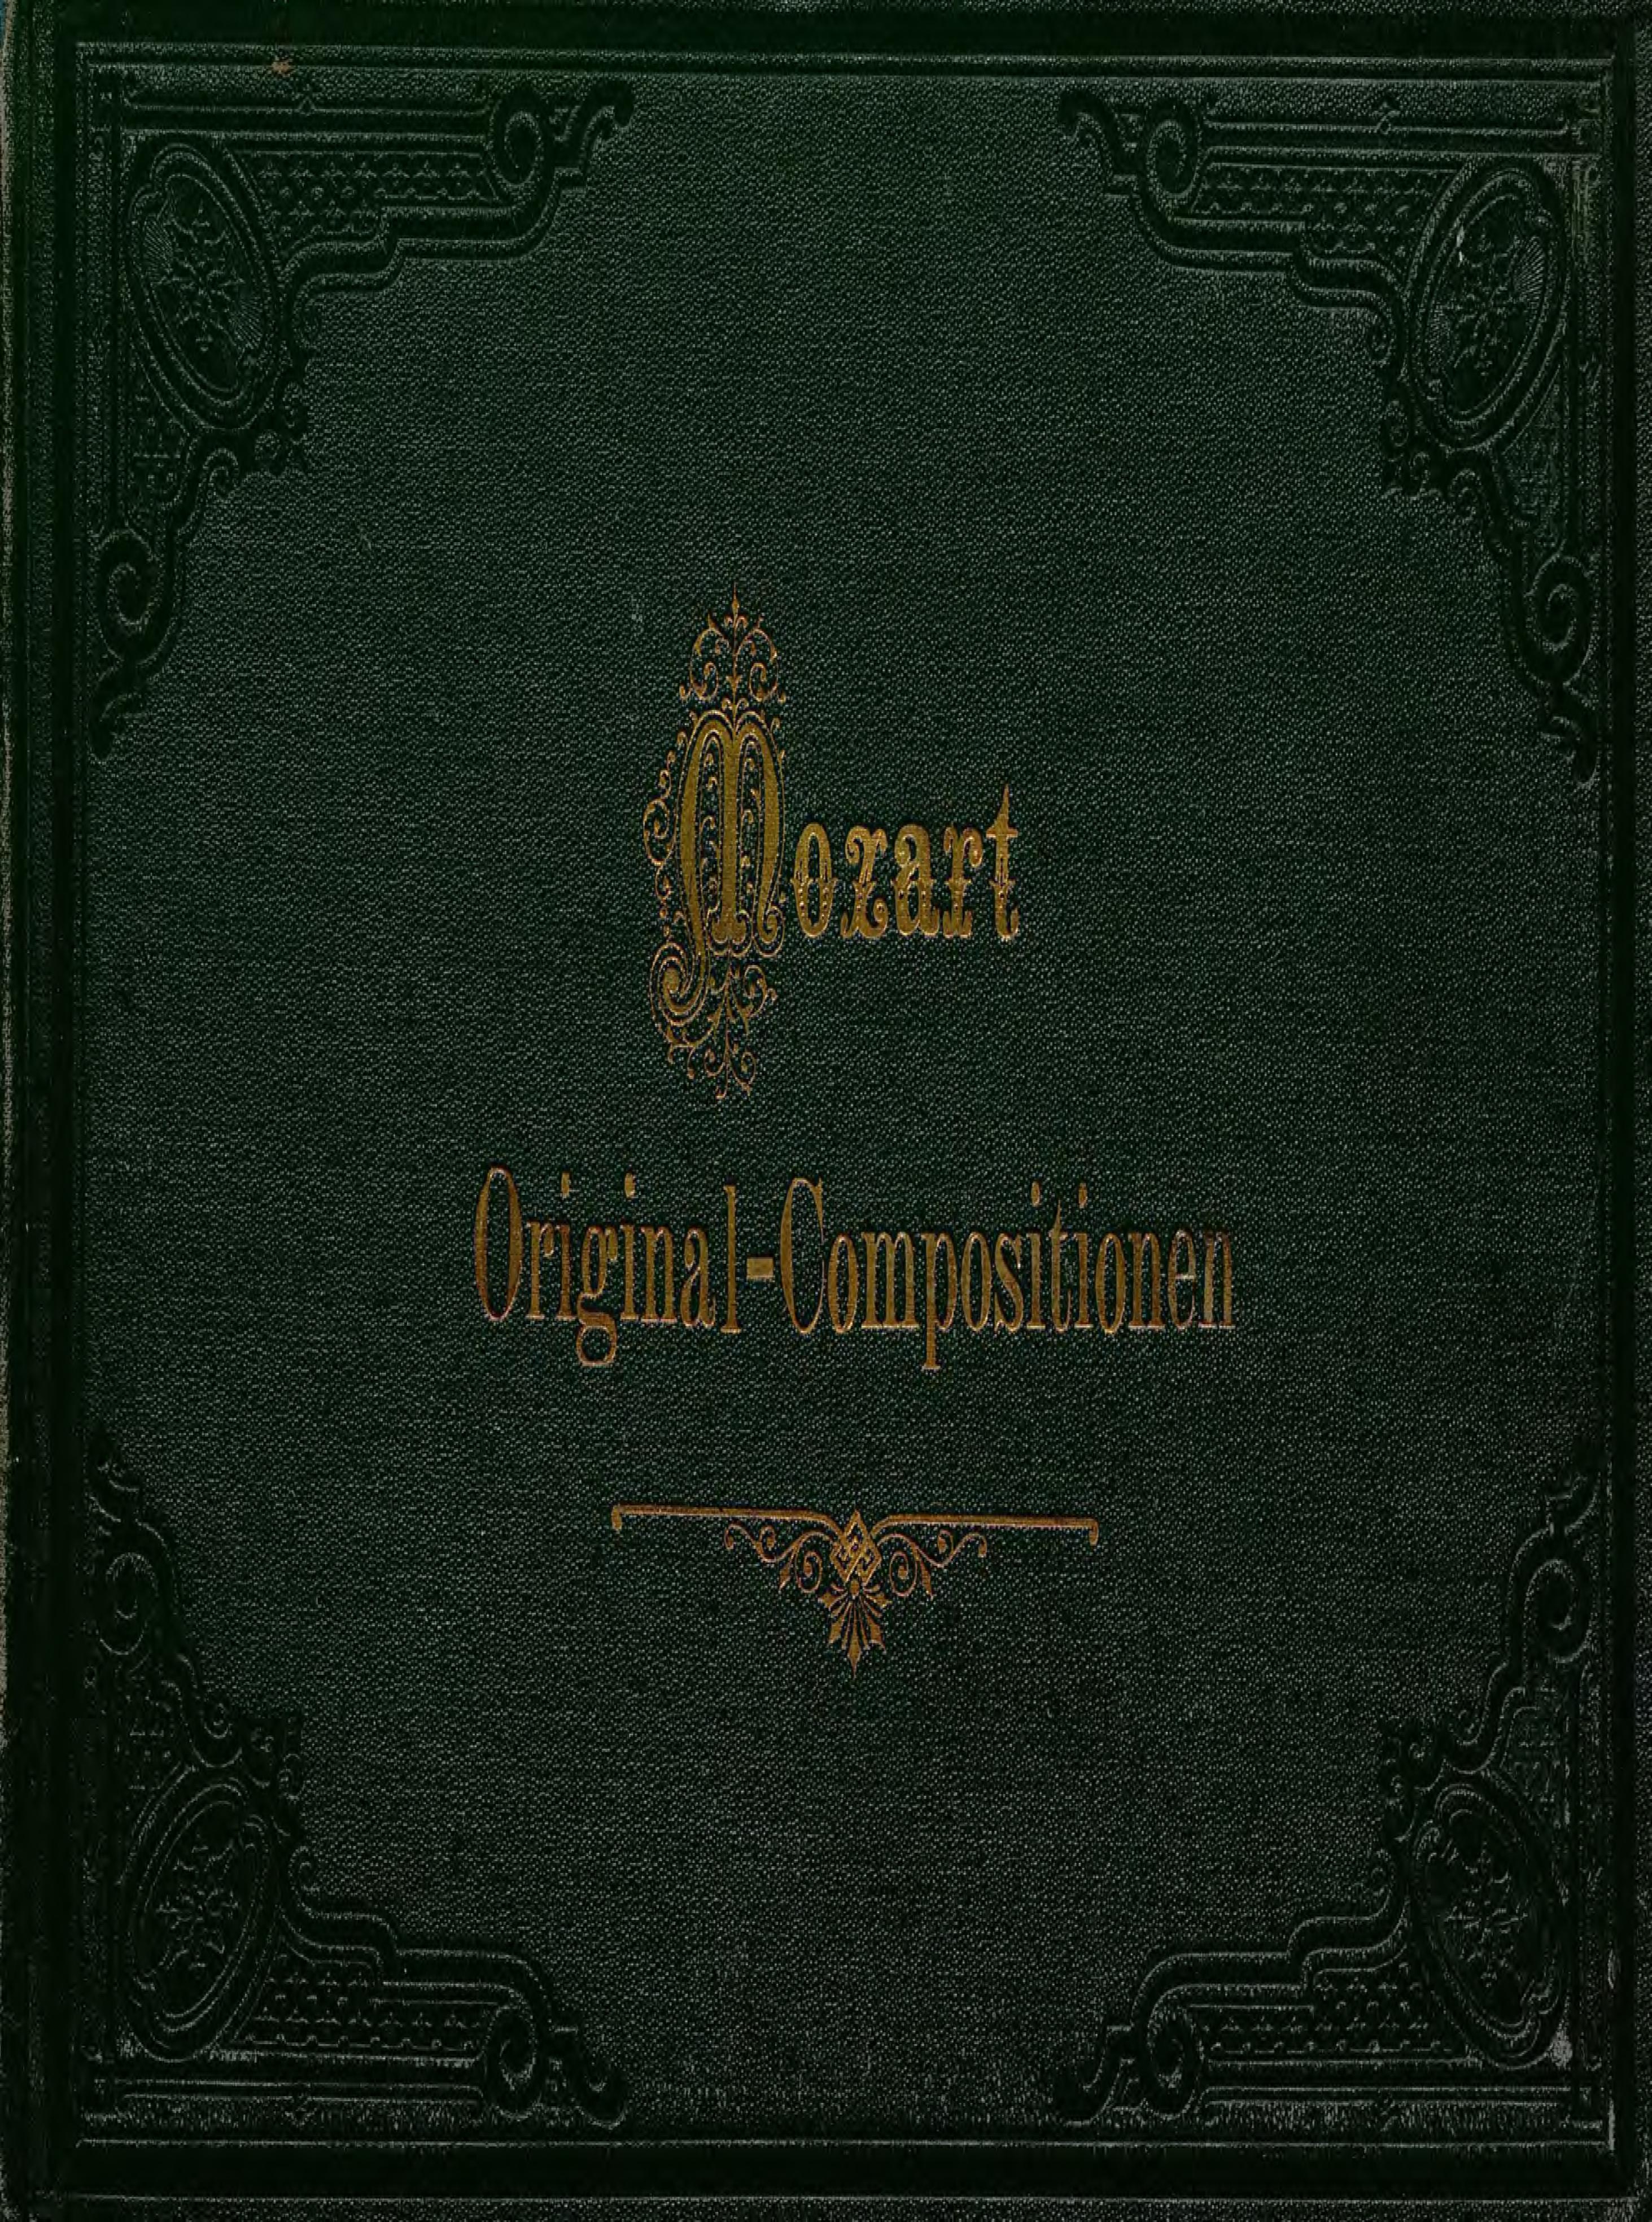 Вольфганг Амадей Моцарт Original-Compositionen fur Pianoforte zu vier Handen v. W. A. Mozart цена